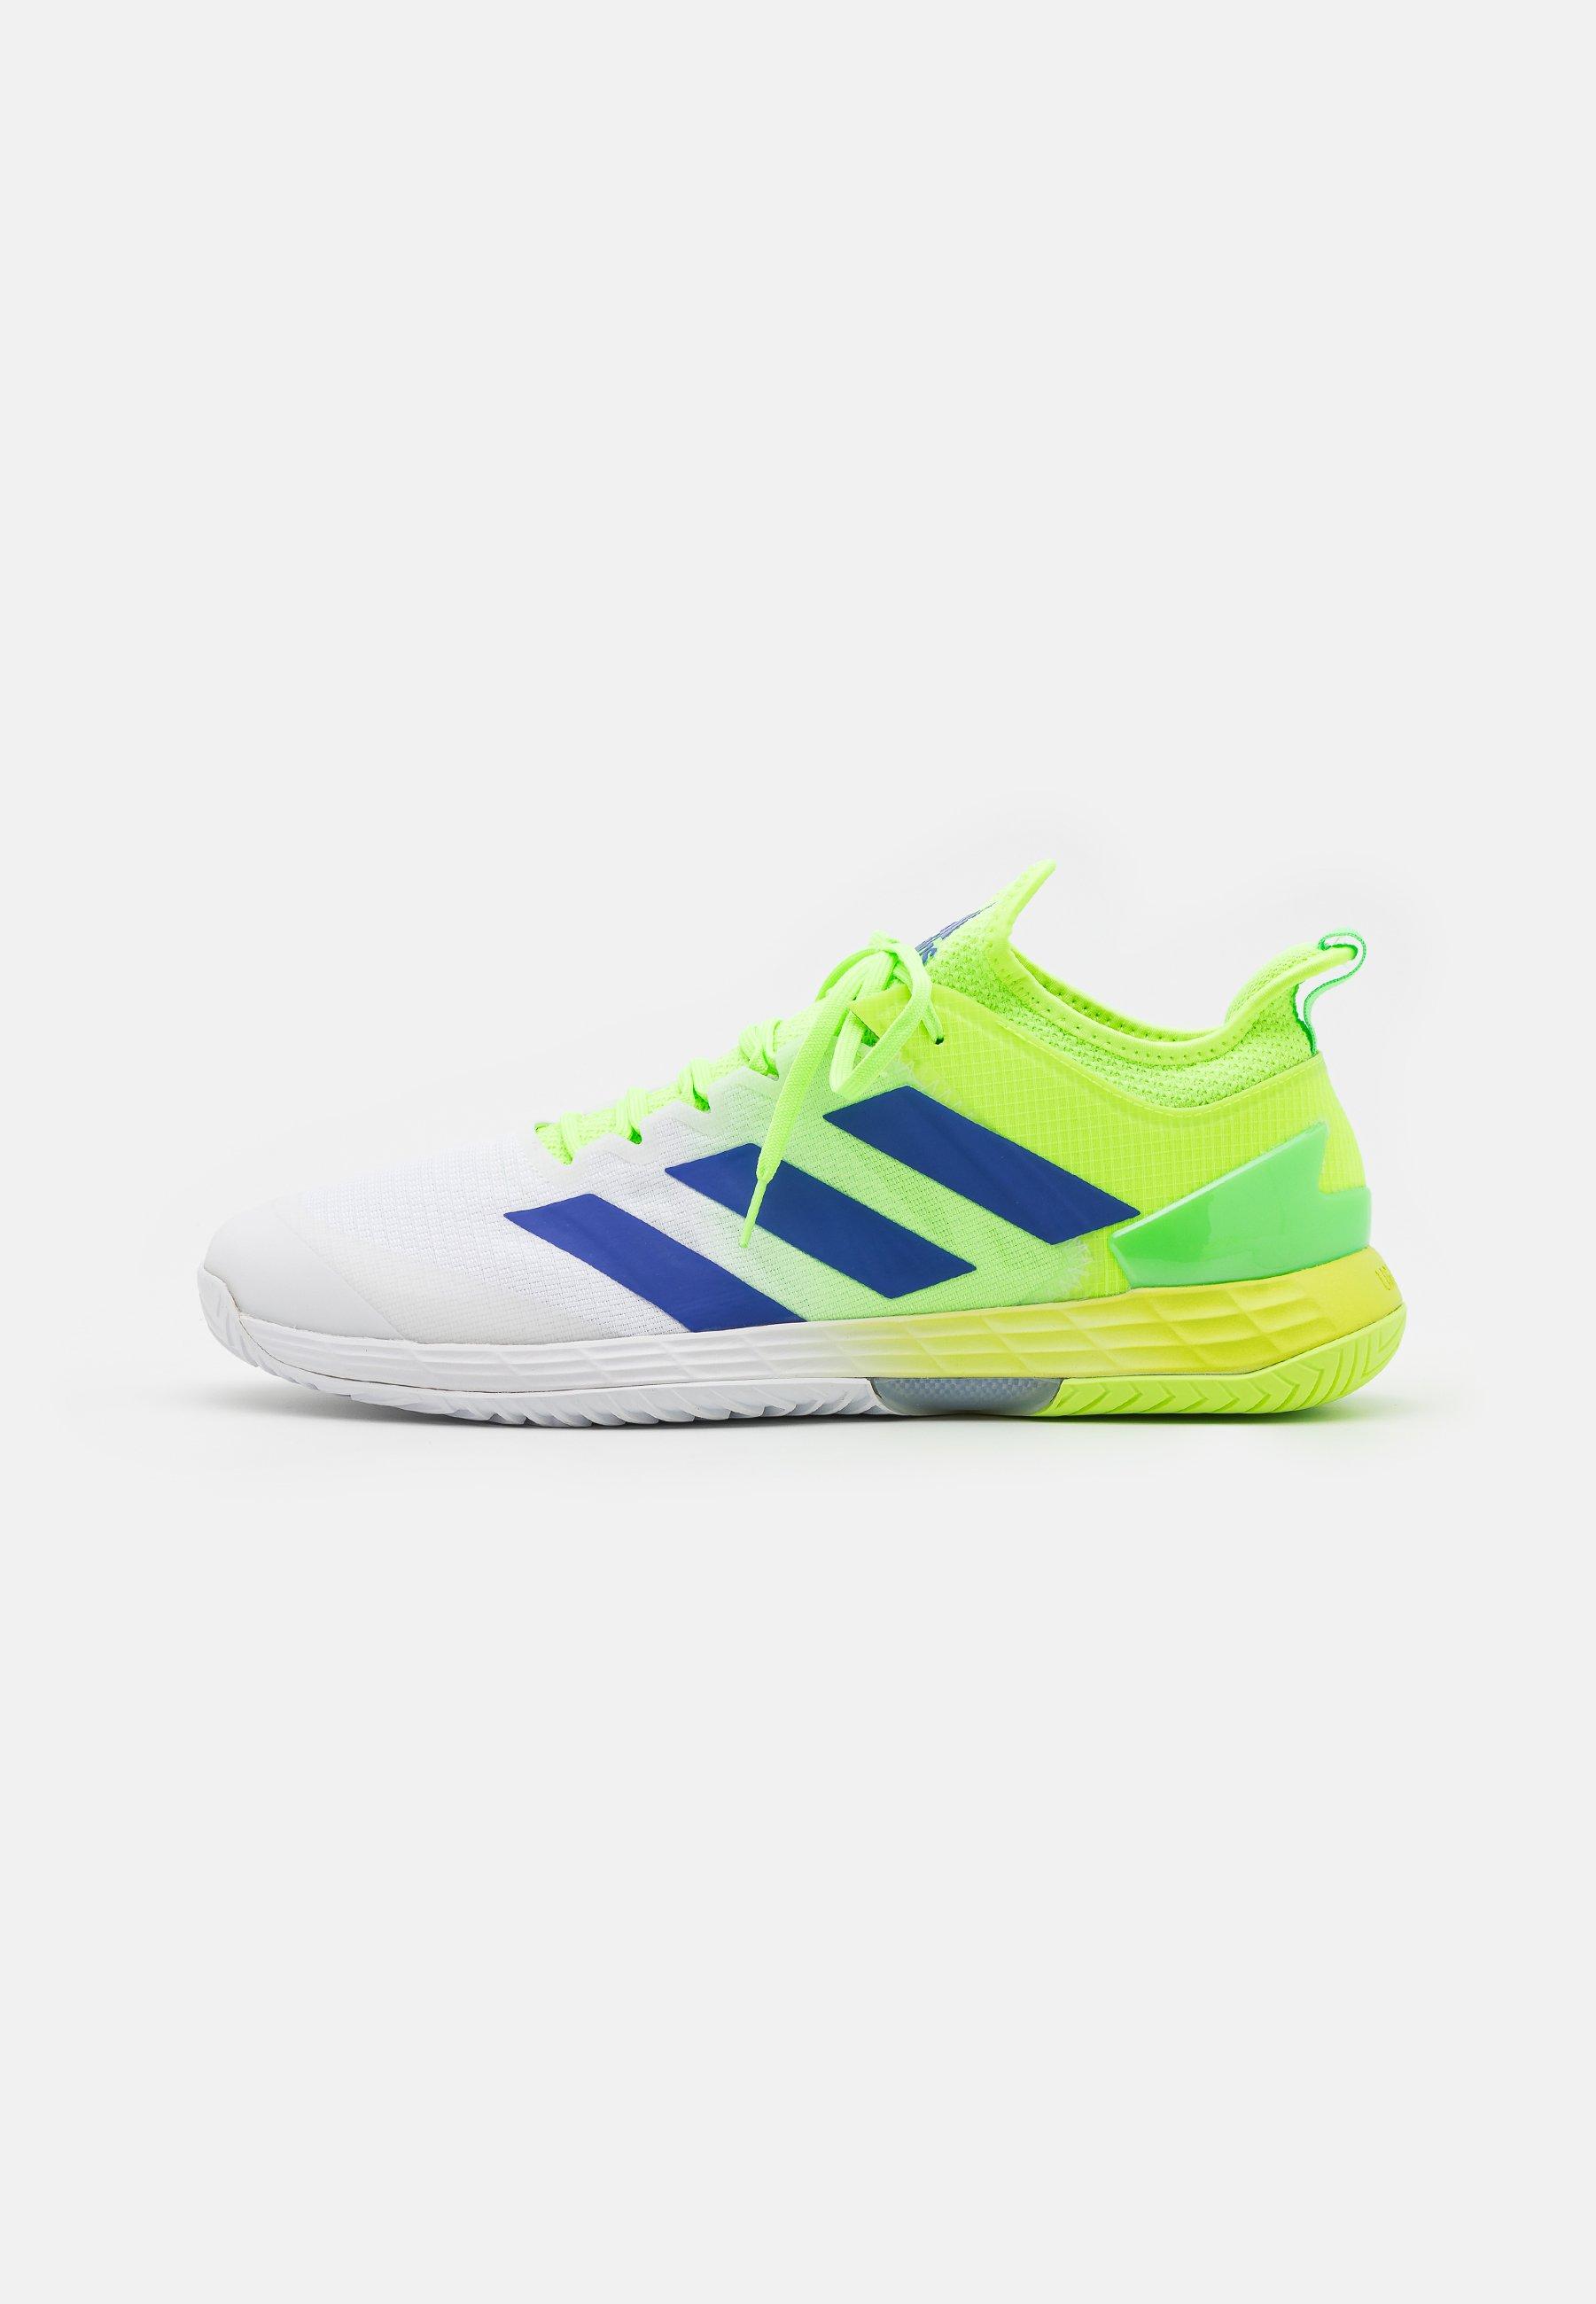 Men ADIZERO UBERSONIC 4 - Multicourt tennis shoes